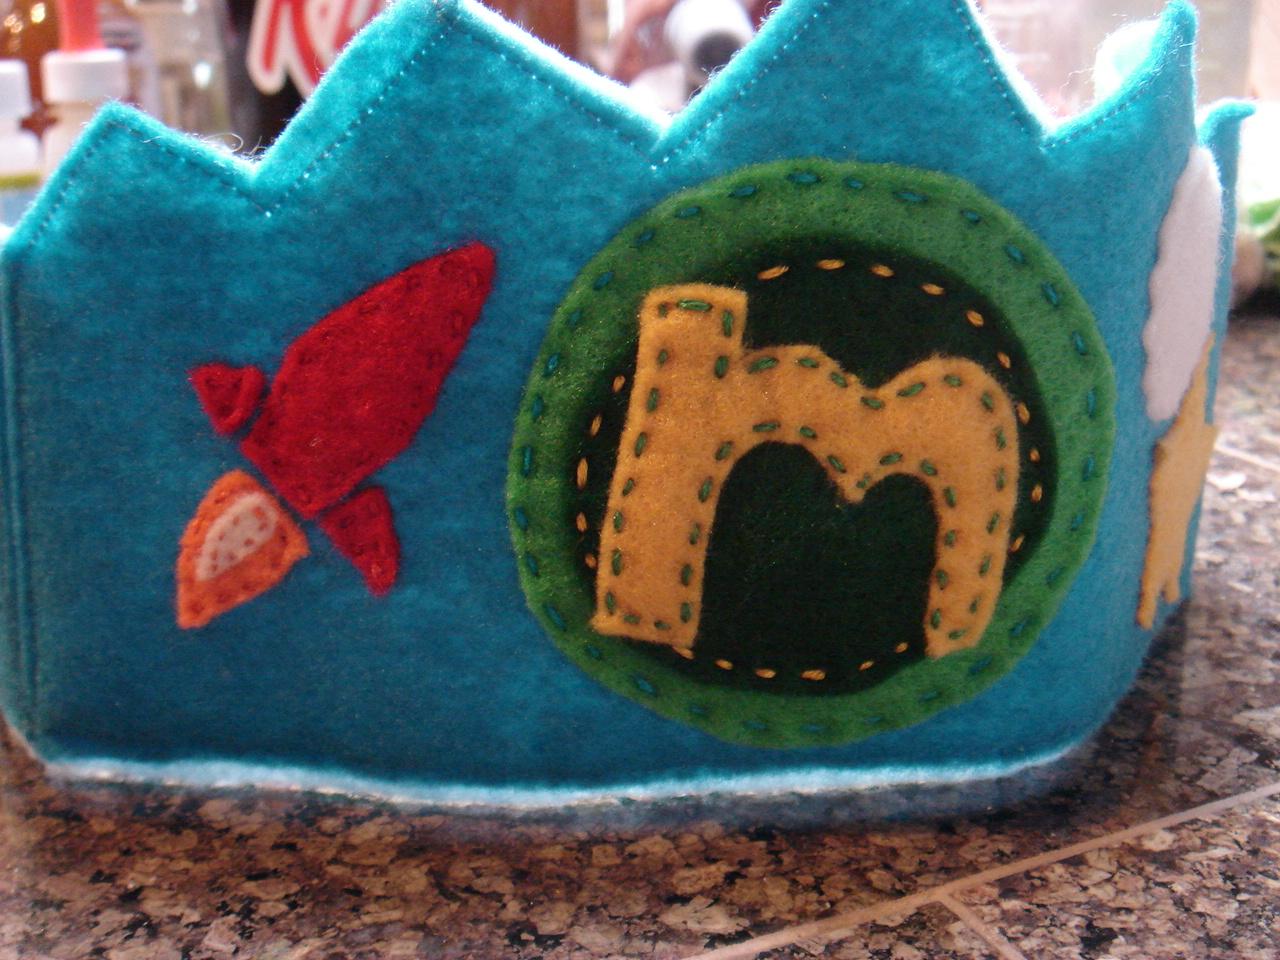 Sew While He Sleeps: Christmas Gifts For My Niece And Nephew